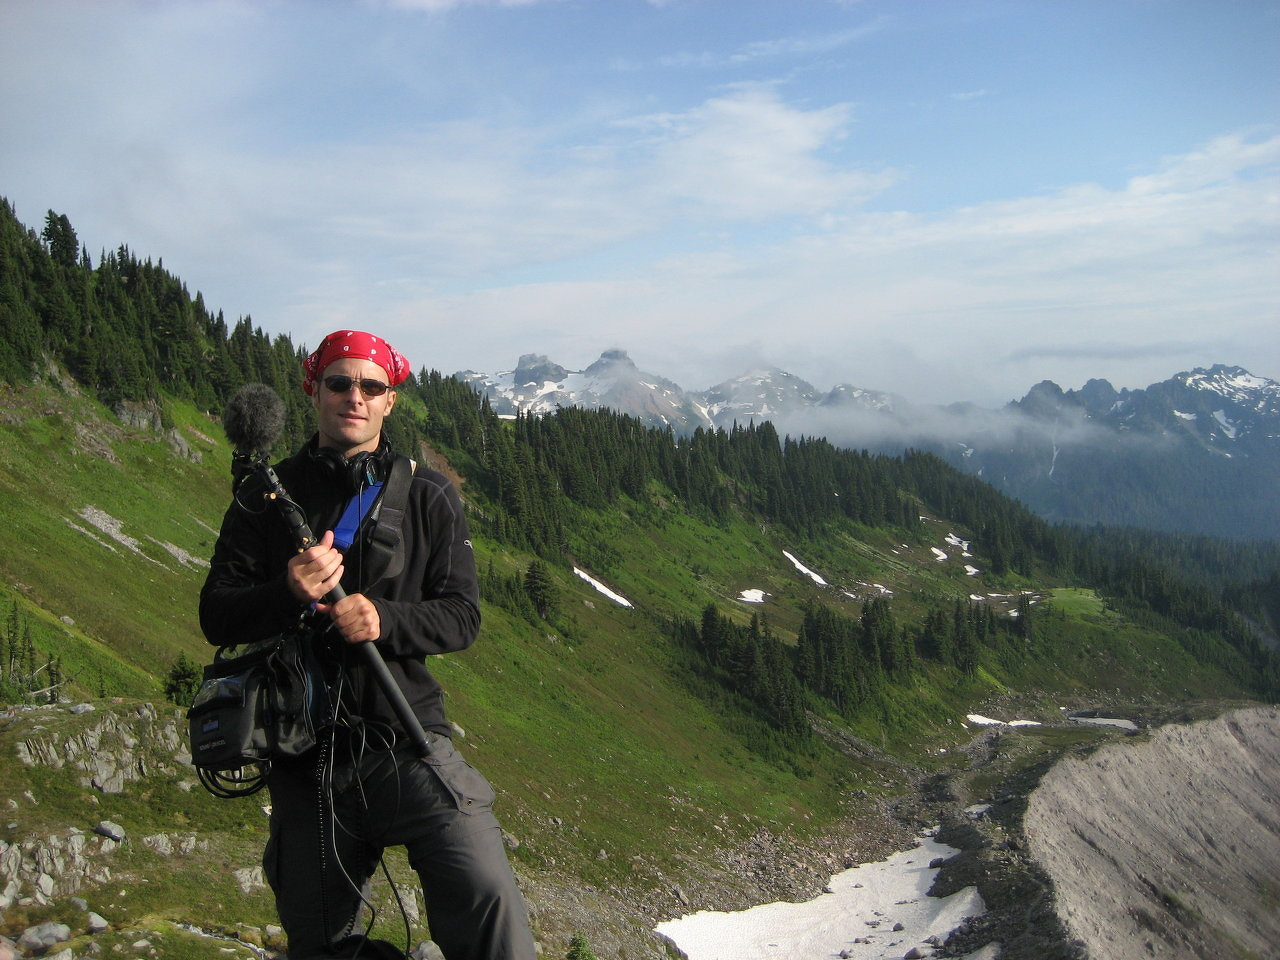 'A Restless Giant' Mount Rainier